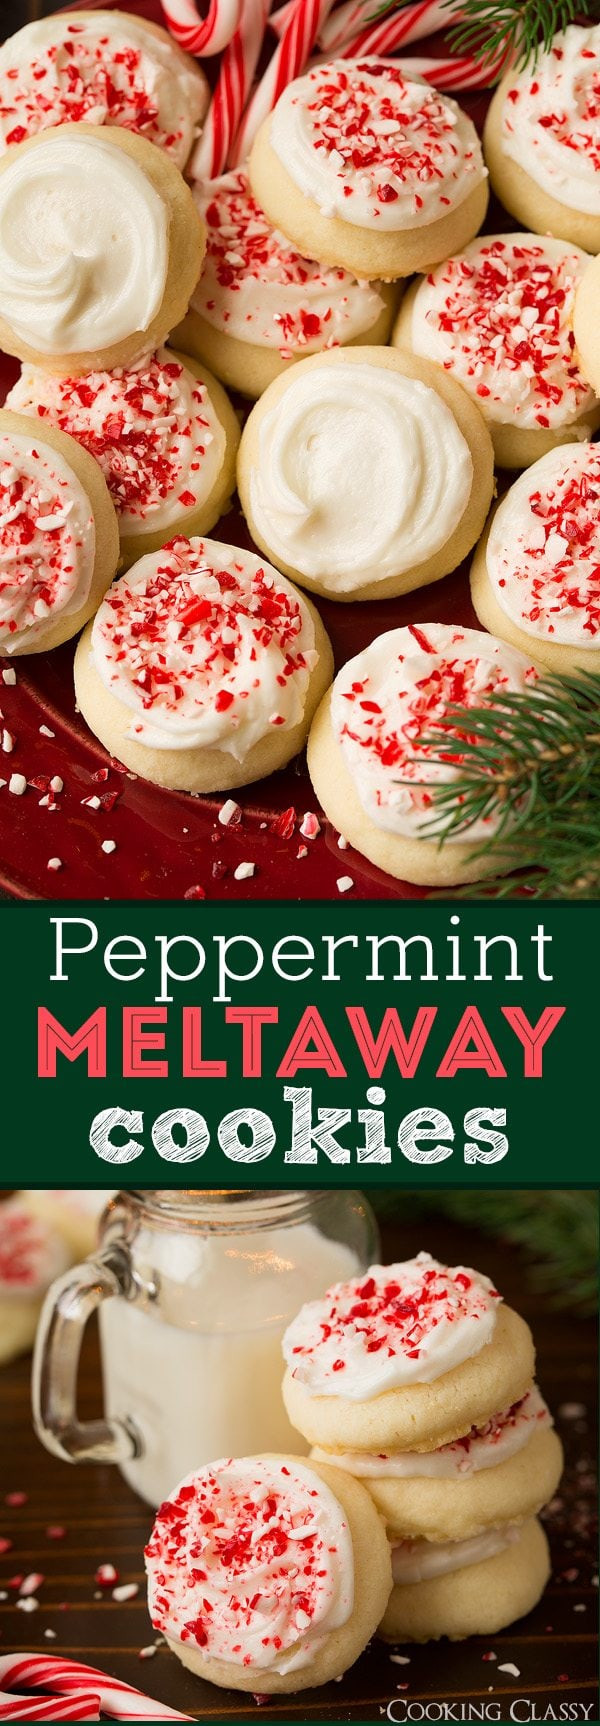 Christmas Meltaway Cookies  Peppermint Meltaway Cookies Cooking Classy